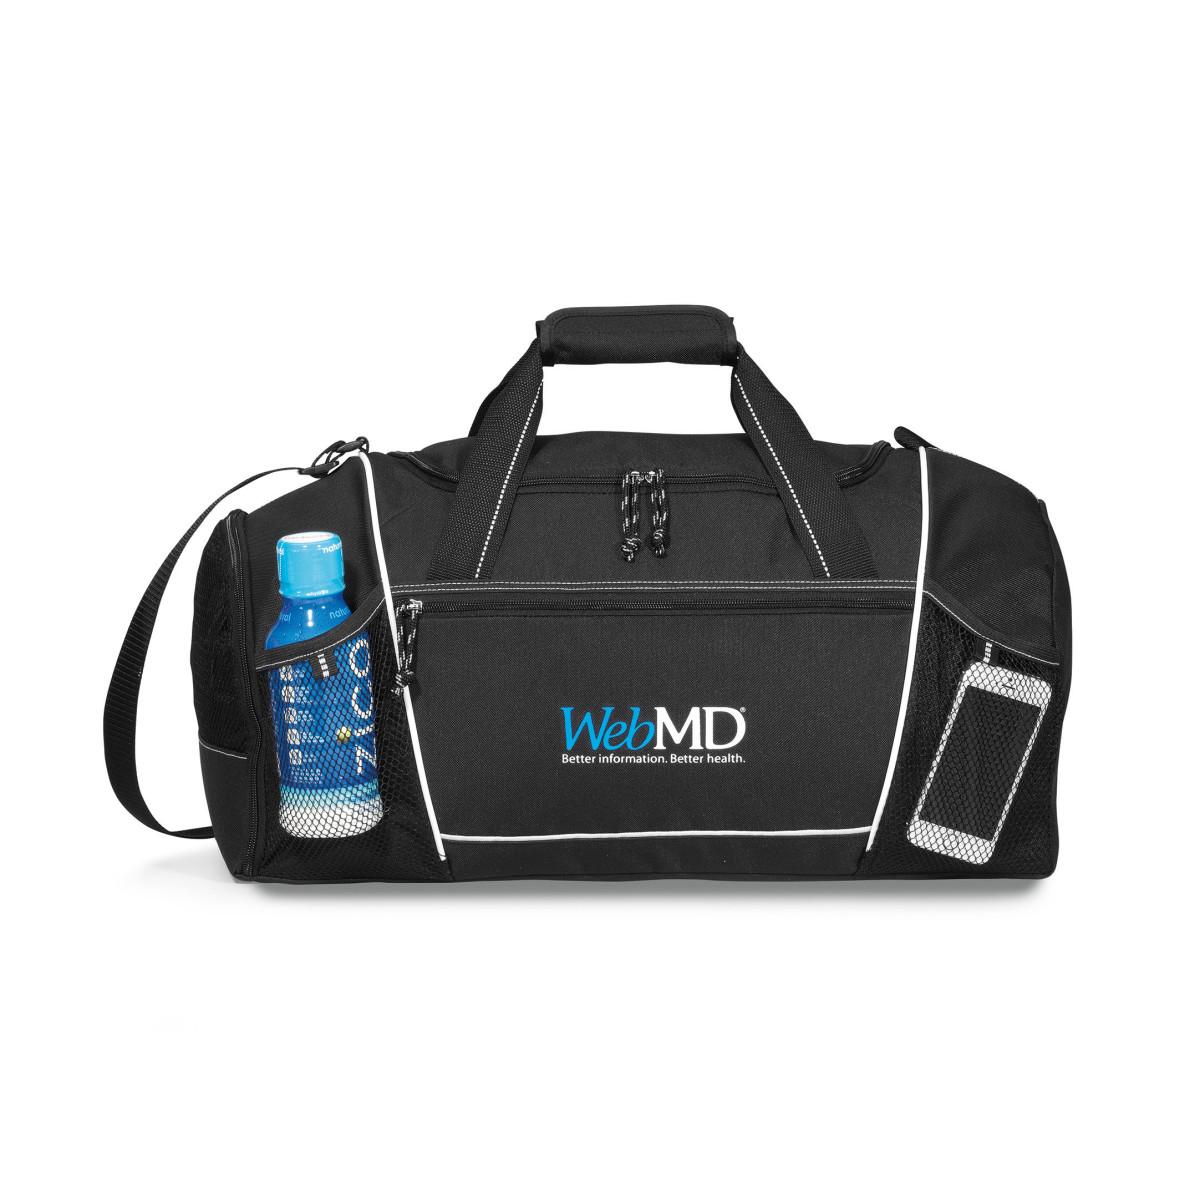 Gemline 4572 - Endurance Sport Bag